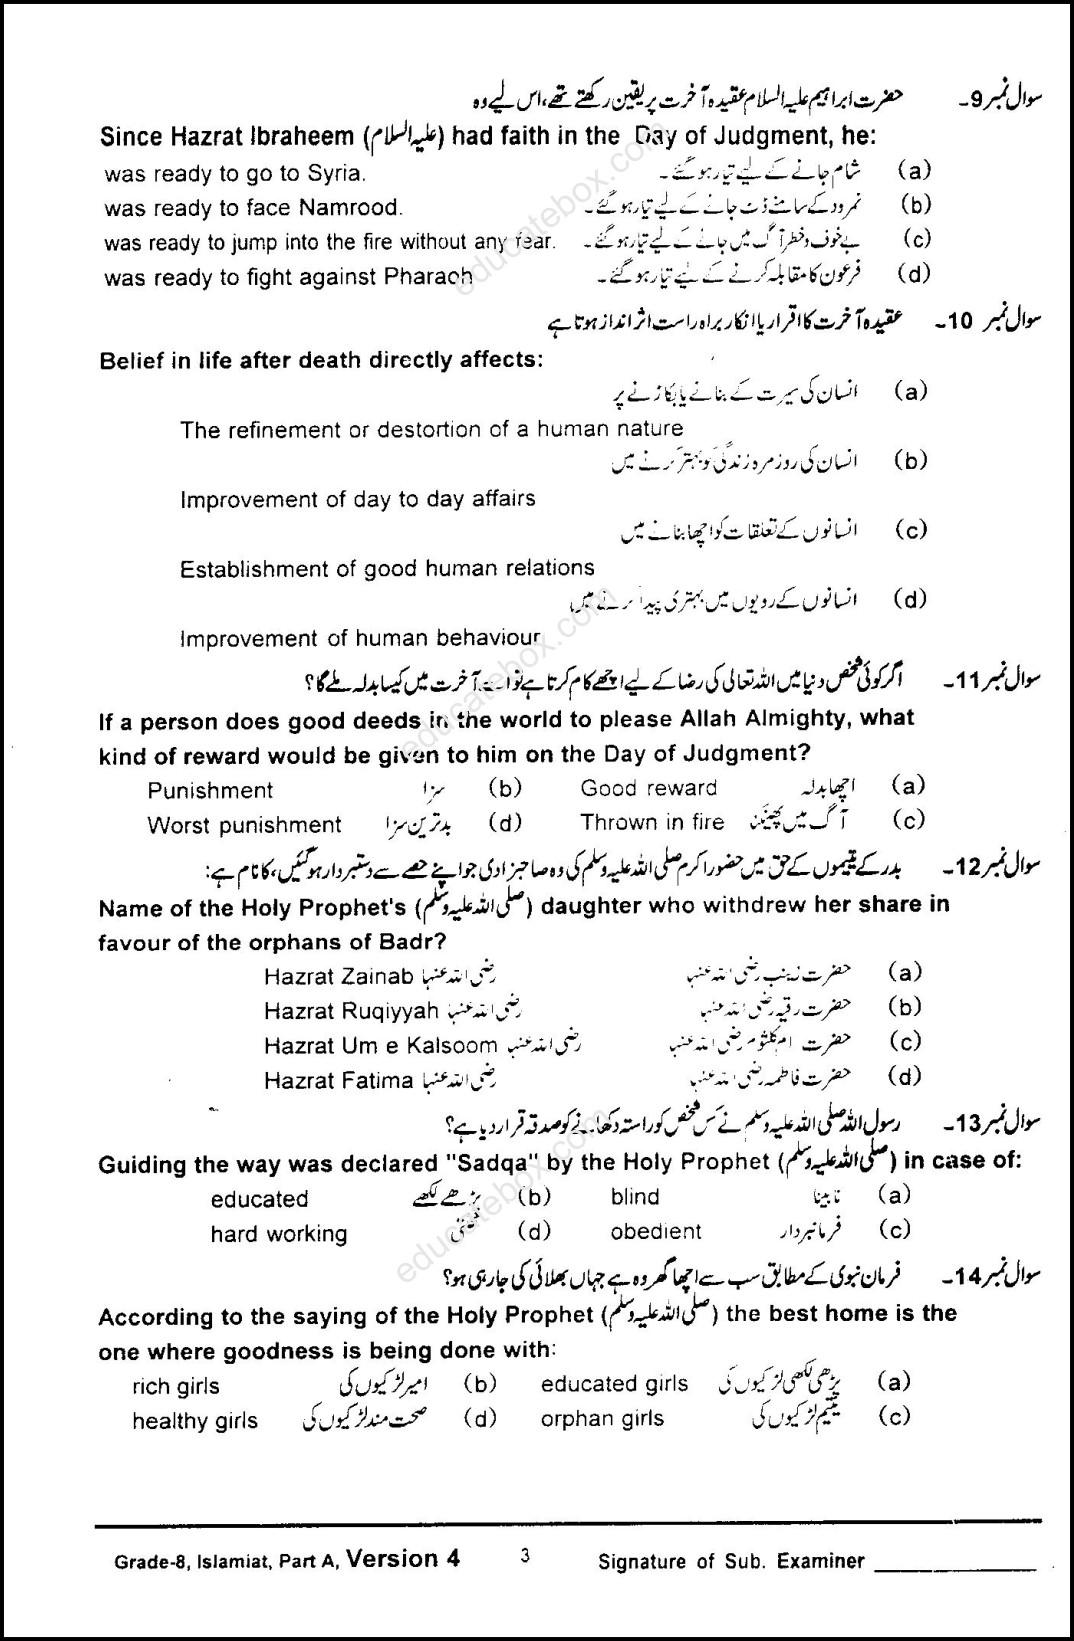 Past Paper Class 8 Islamiat PEC 2015 Part A Objective Ver 4 - Page 3